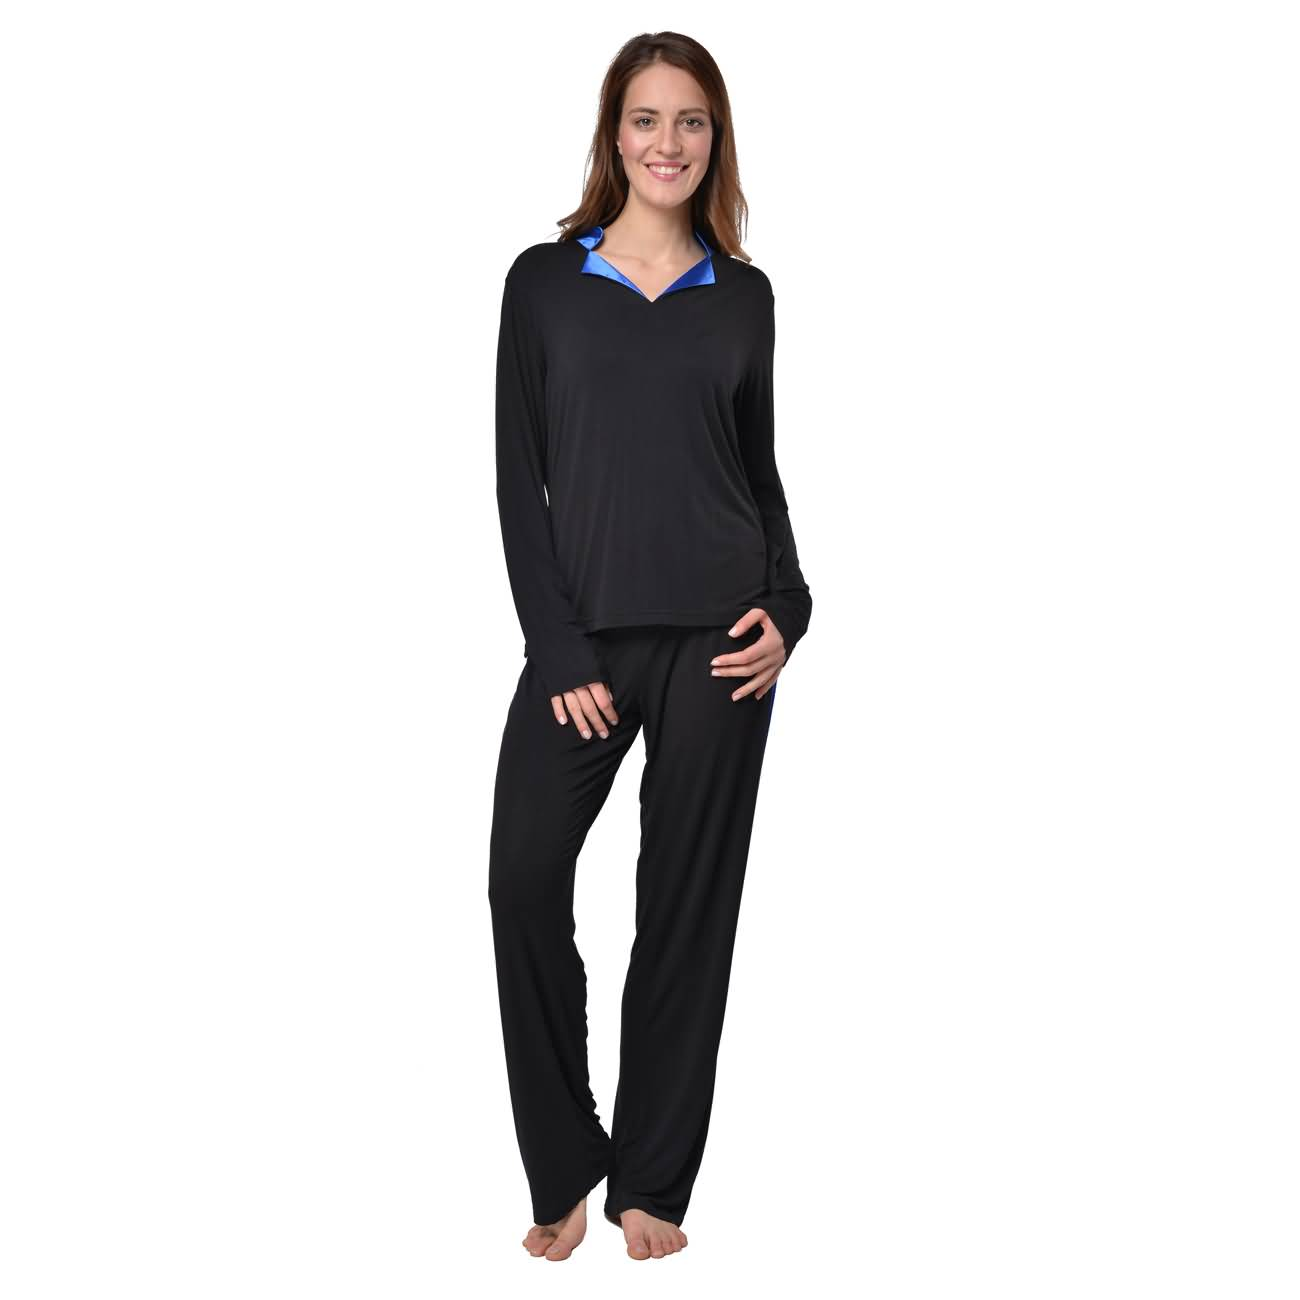 huge selection of fb3c6 ecf91 RAIKOU Damen Langarm Pyjama Schlafanzug Hausanzug ...